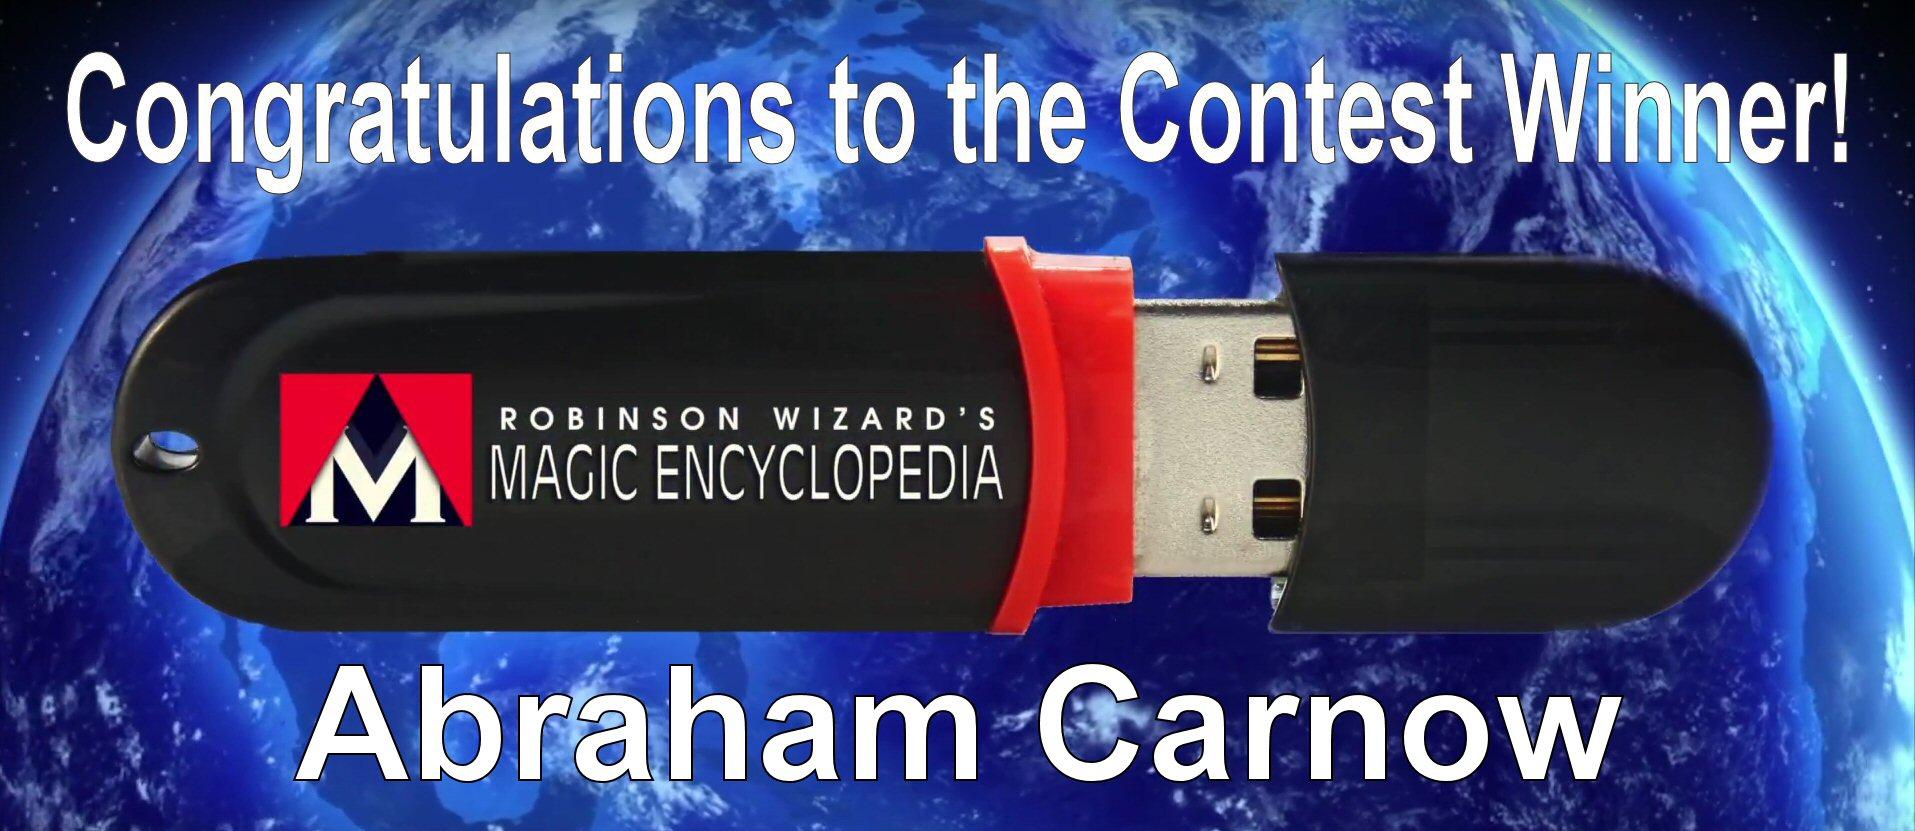 Flash Drive Contest Winner.jpg